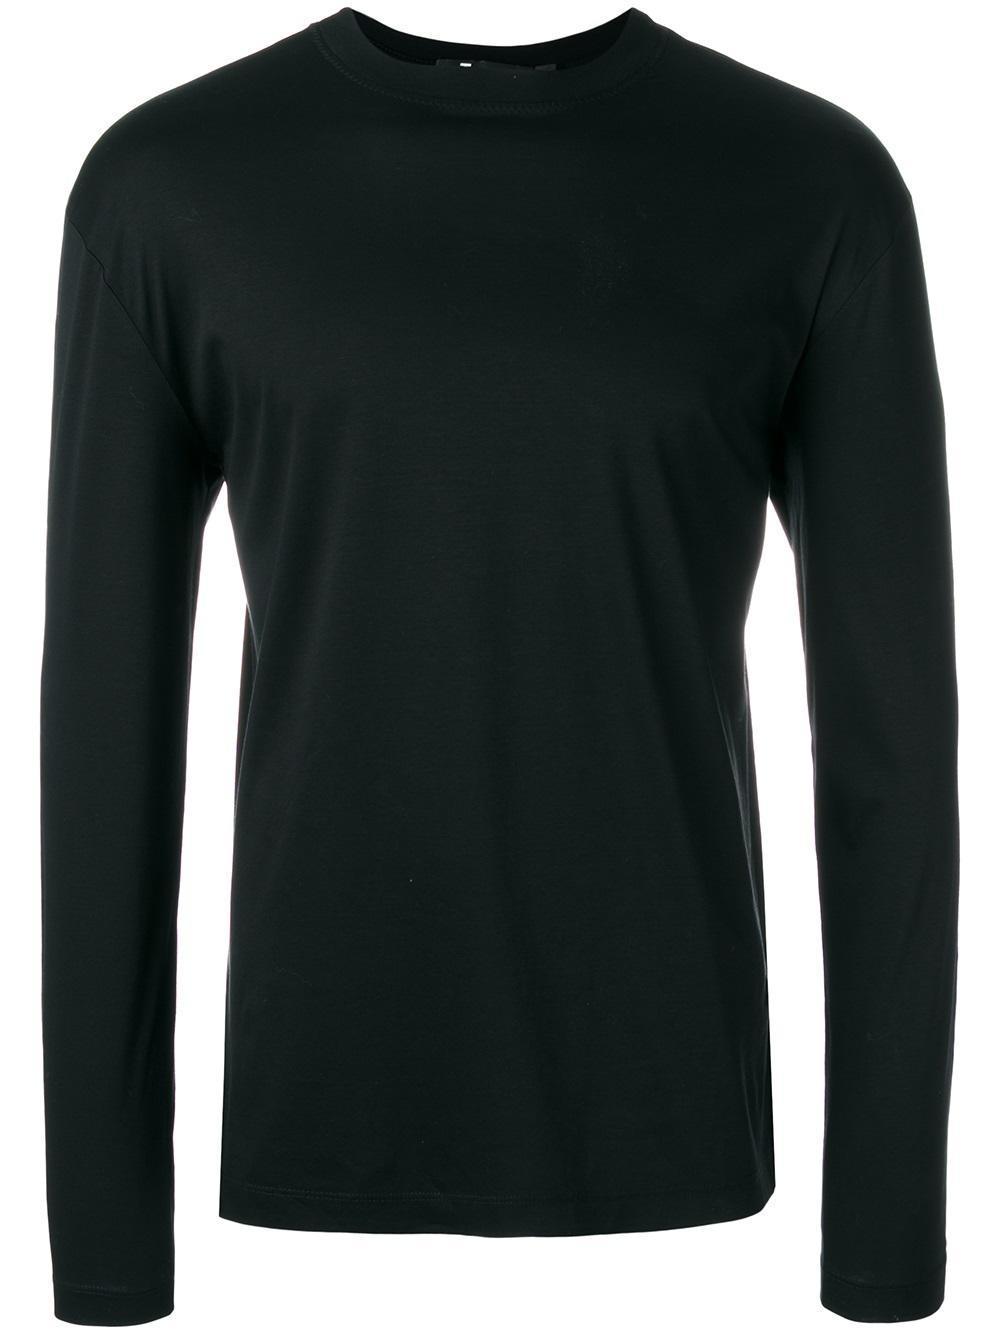 t by alexander wang longsleeved t shirt in black for men lyst. Black Bedroom Furniture Sets. Home Design Ideas